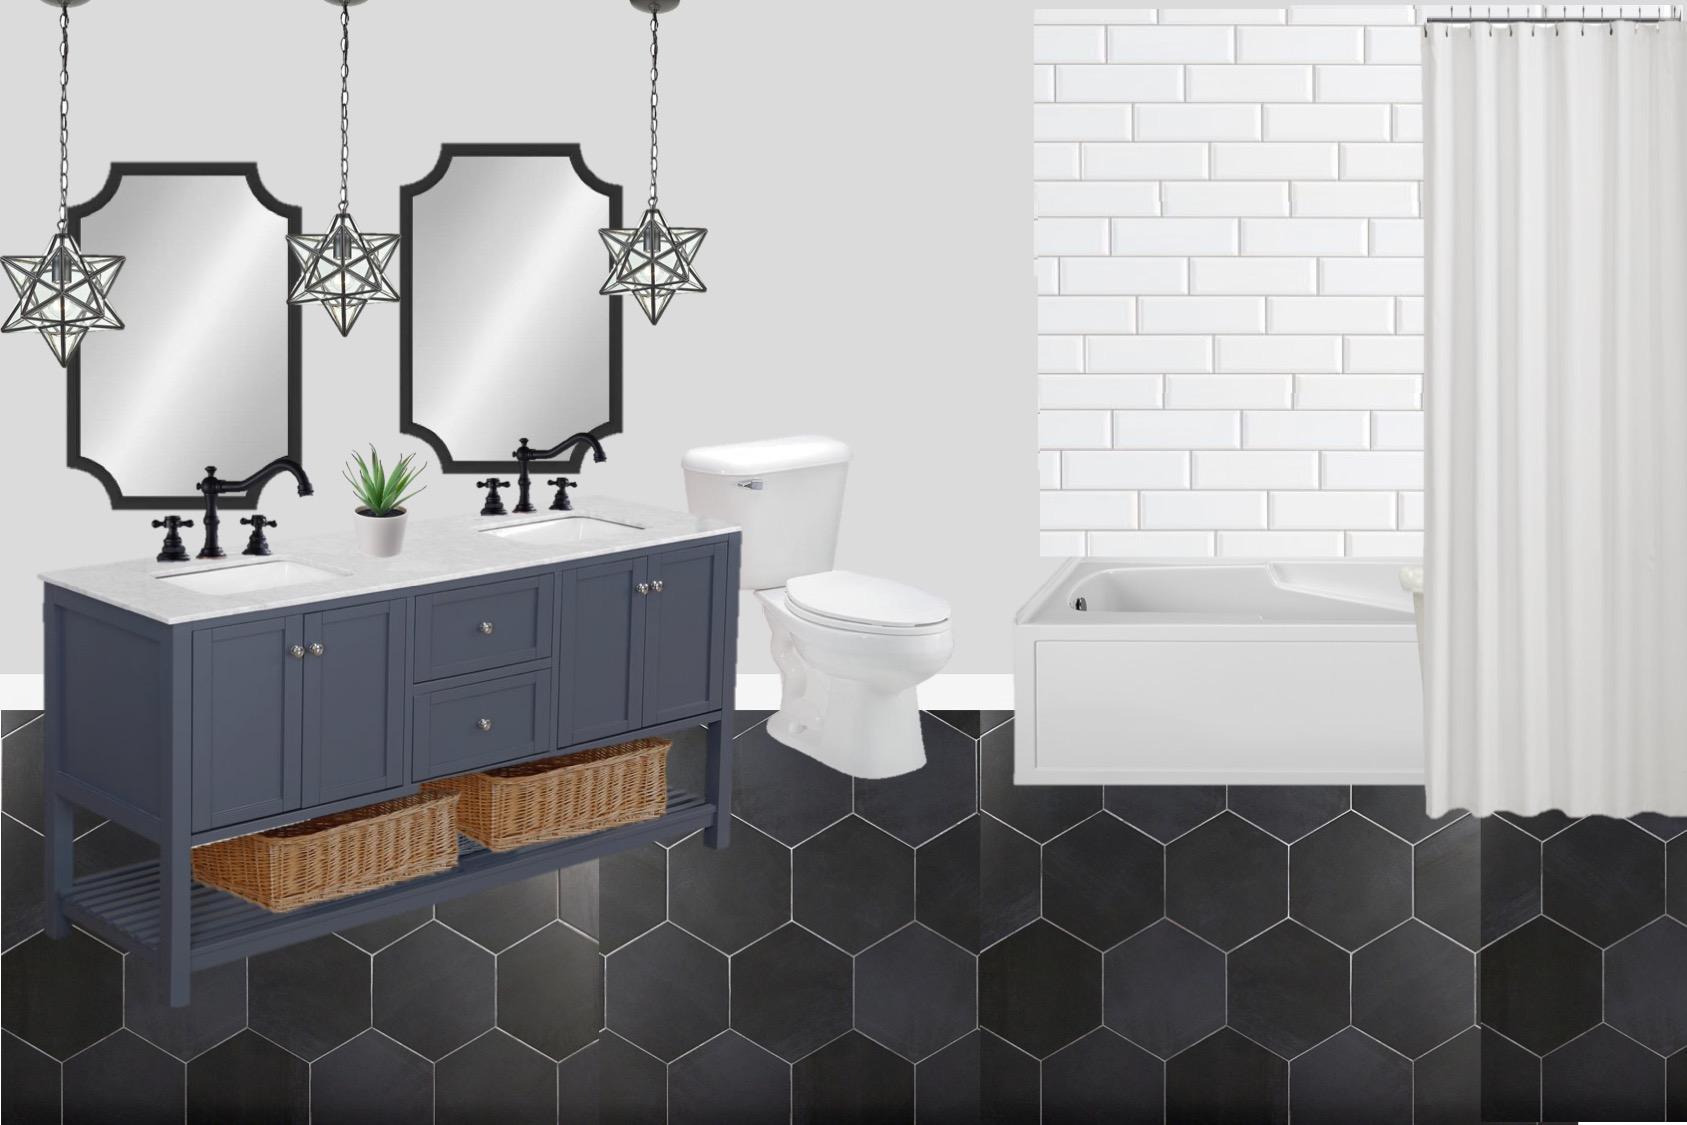 Budget Friendly Modern Farmhouse Bathroom Design Interior Design For Beginners